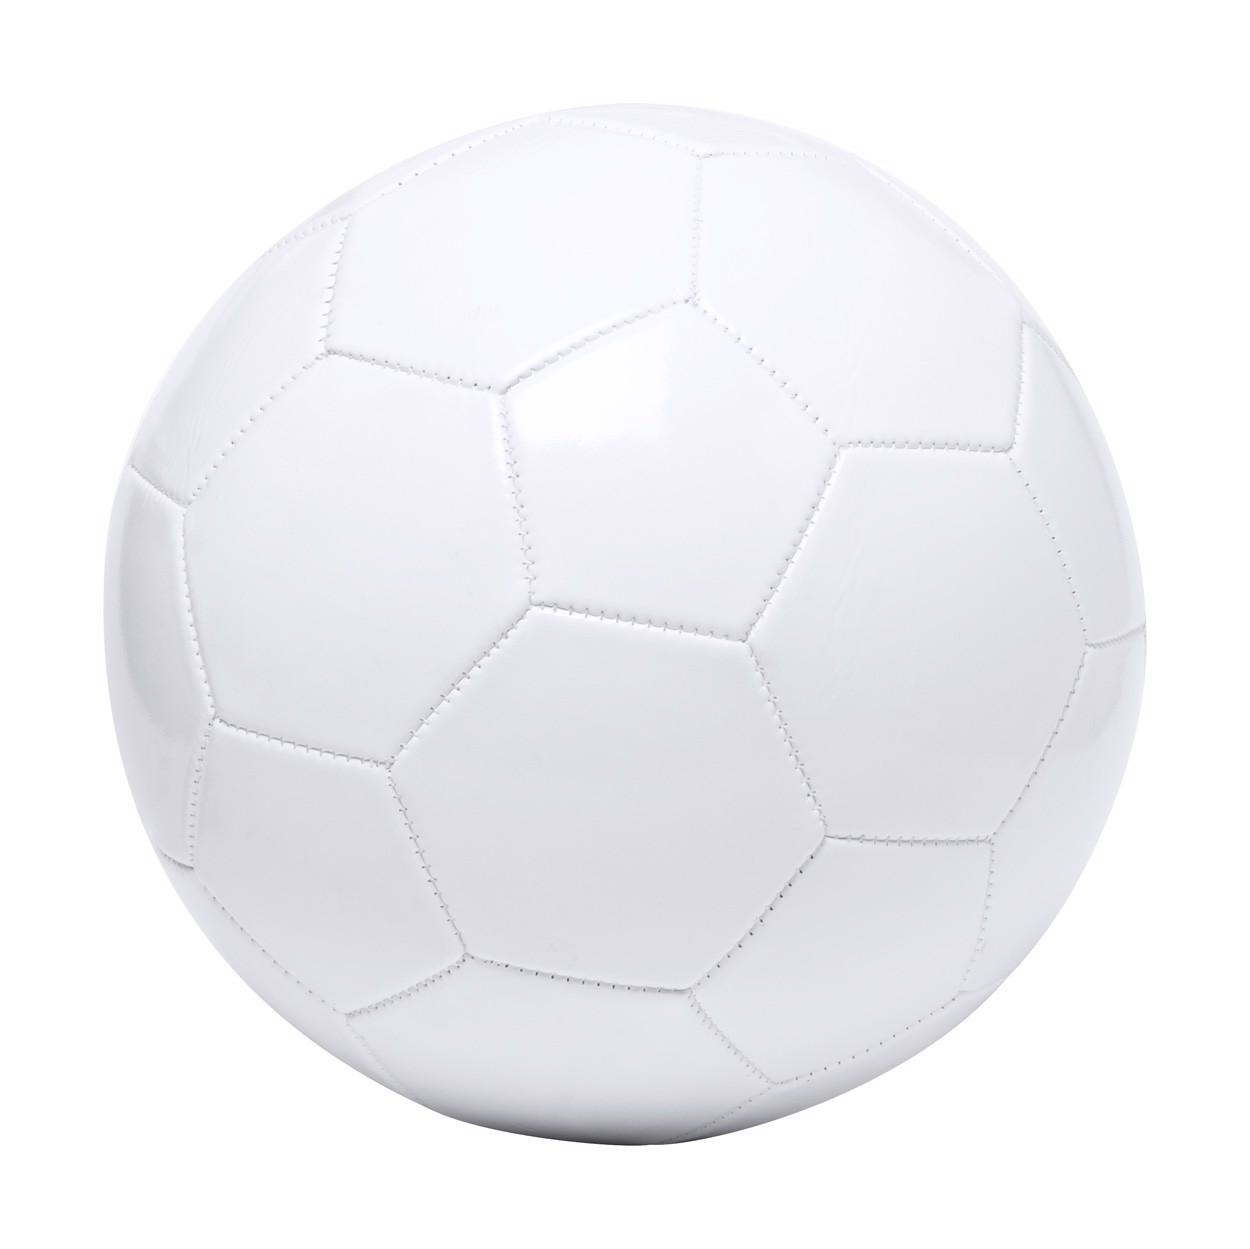 Minge De Fotbal Delko - Alb